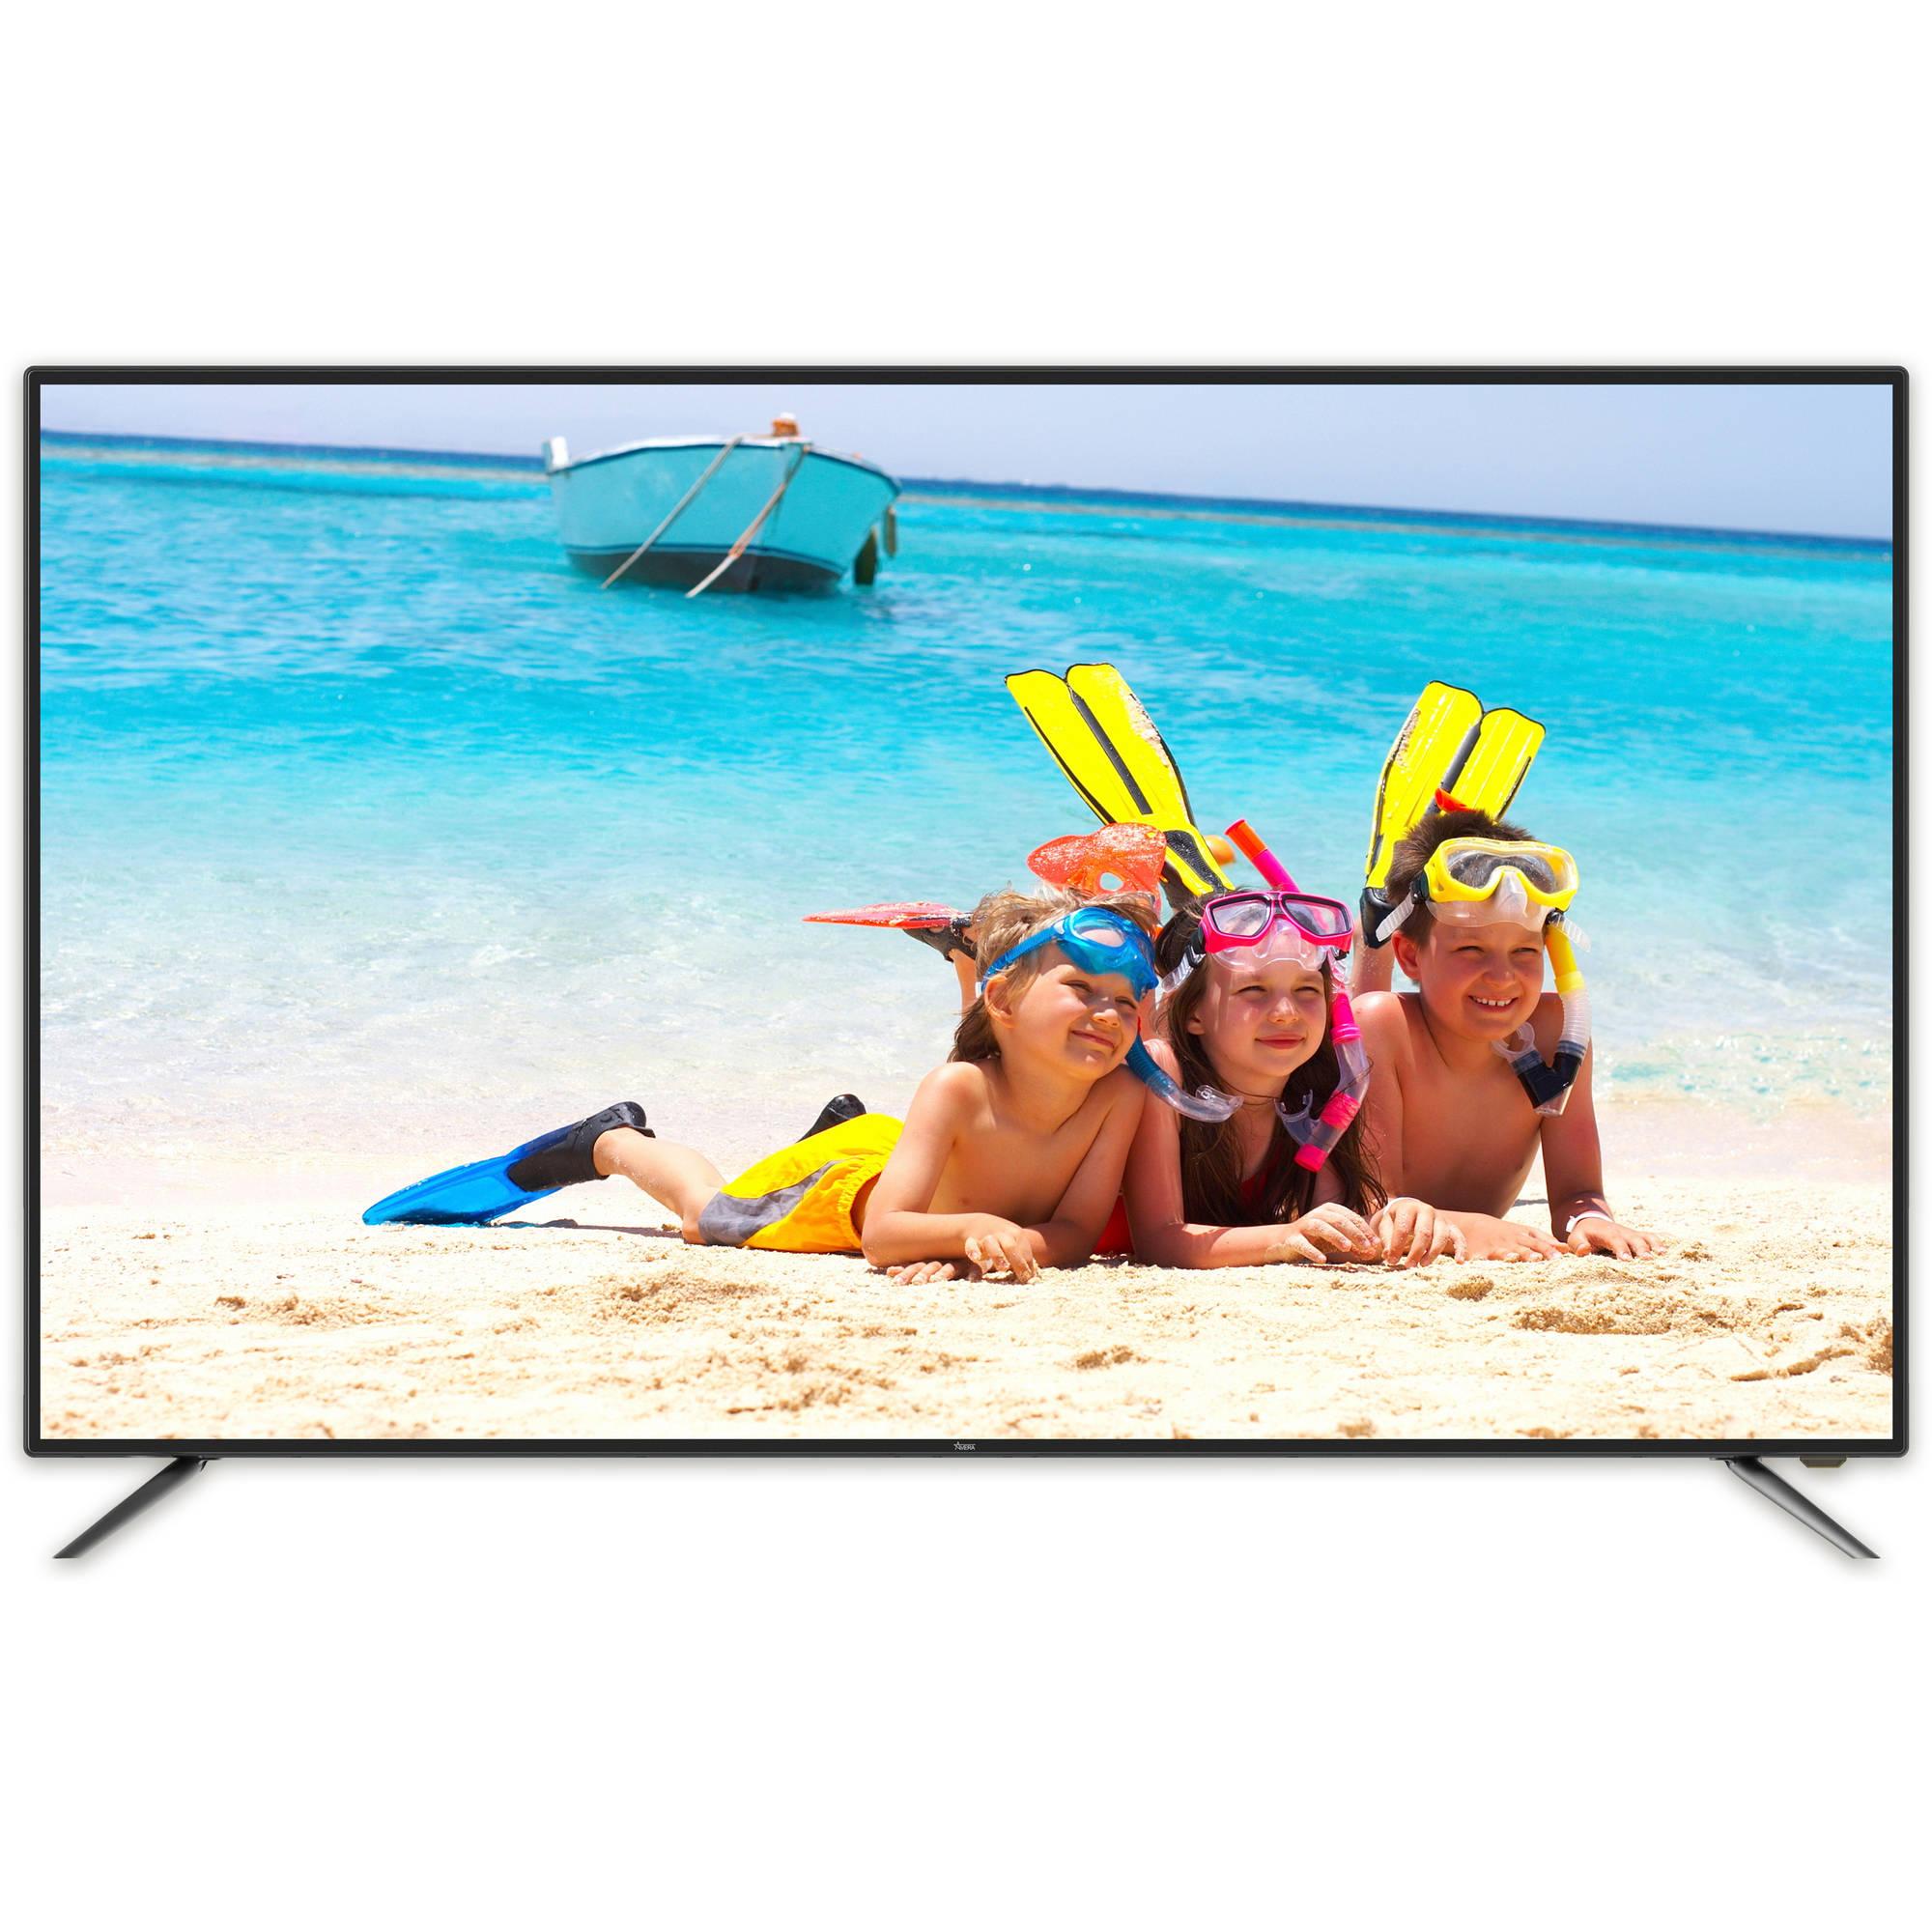 "Avera 55EQX 55"" 4K Ultra HD 2160p 60Hz LED HDTV (4K x 2K) Chroma 4:4:4 HDR TV $278.04 FS Walmart"